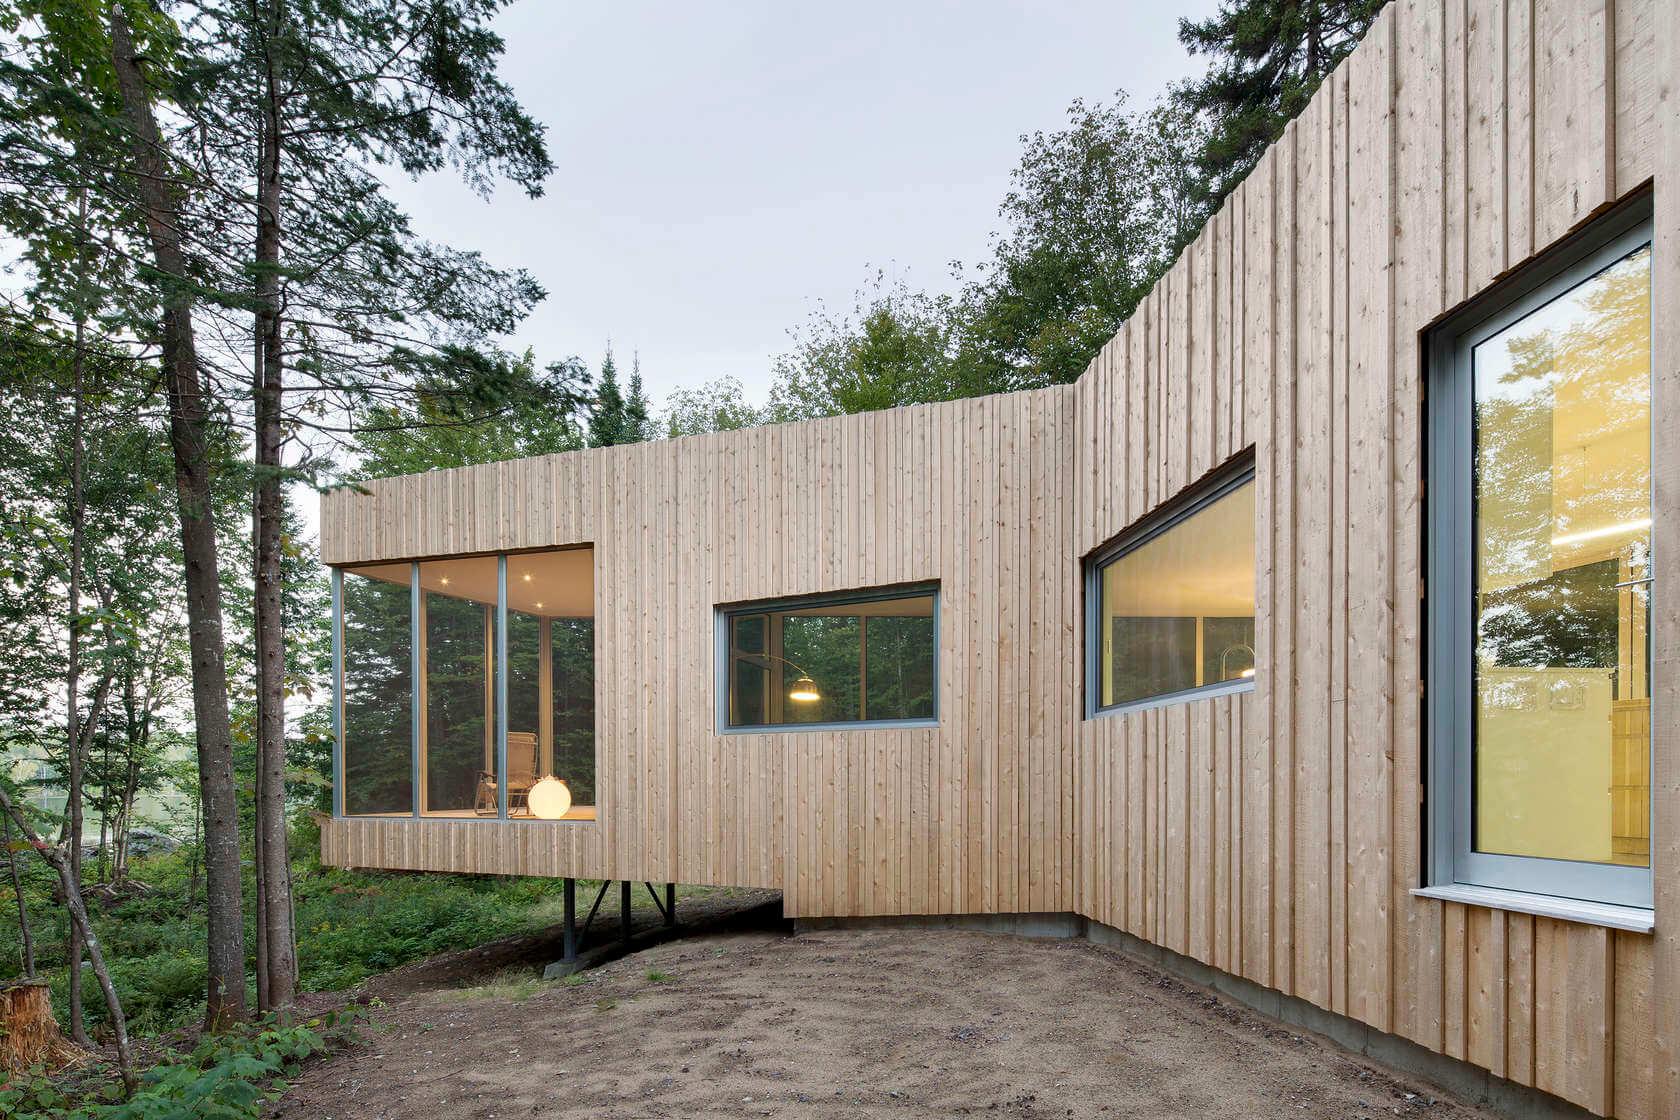 architecture_house_apartment_design_studia_interiors_osnovadesign_osnova_poltava_08